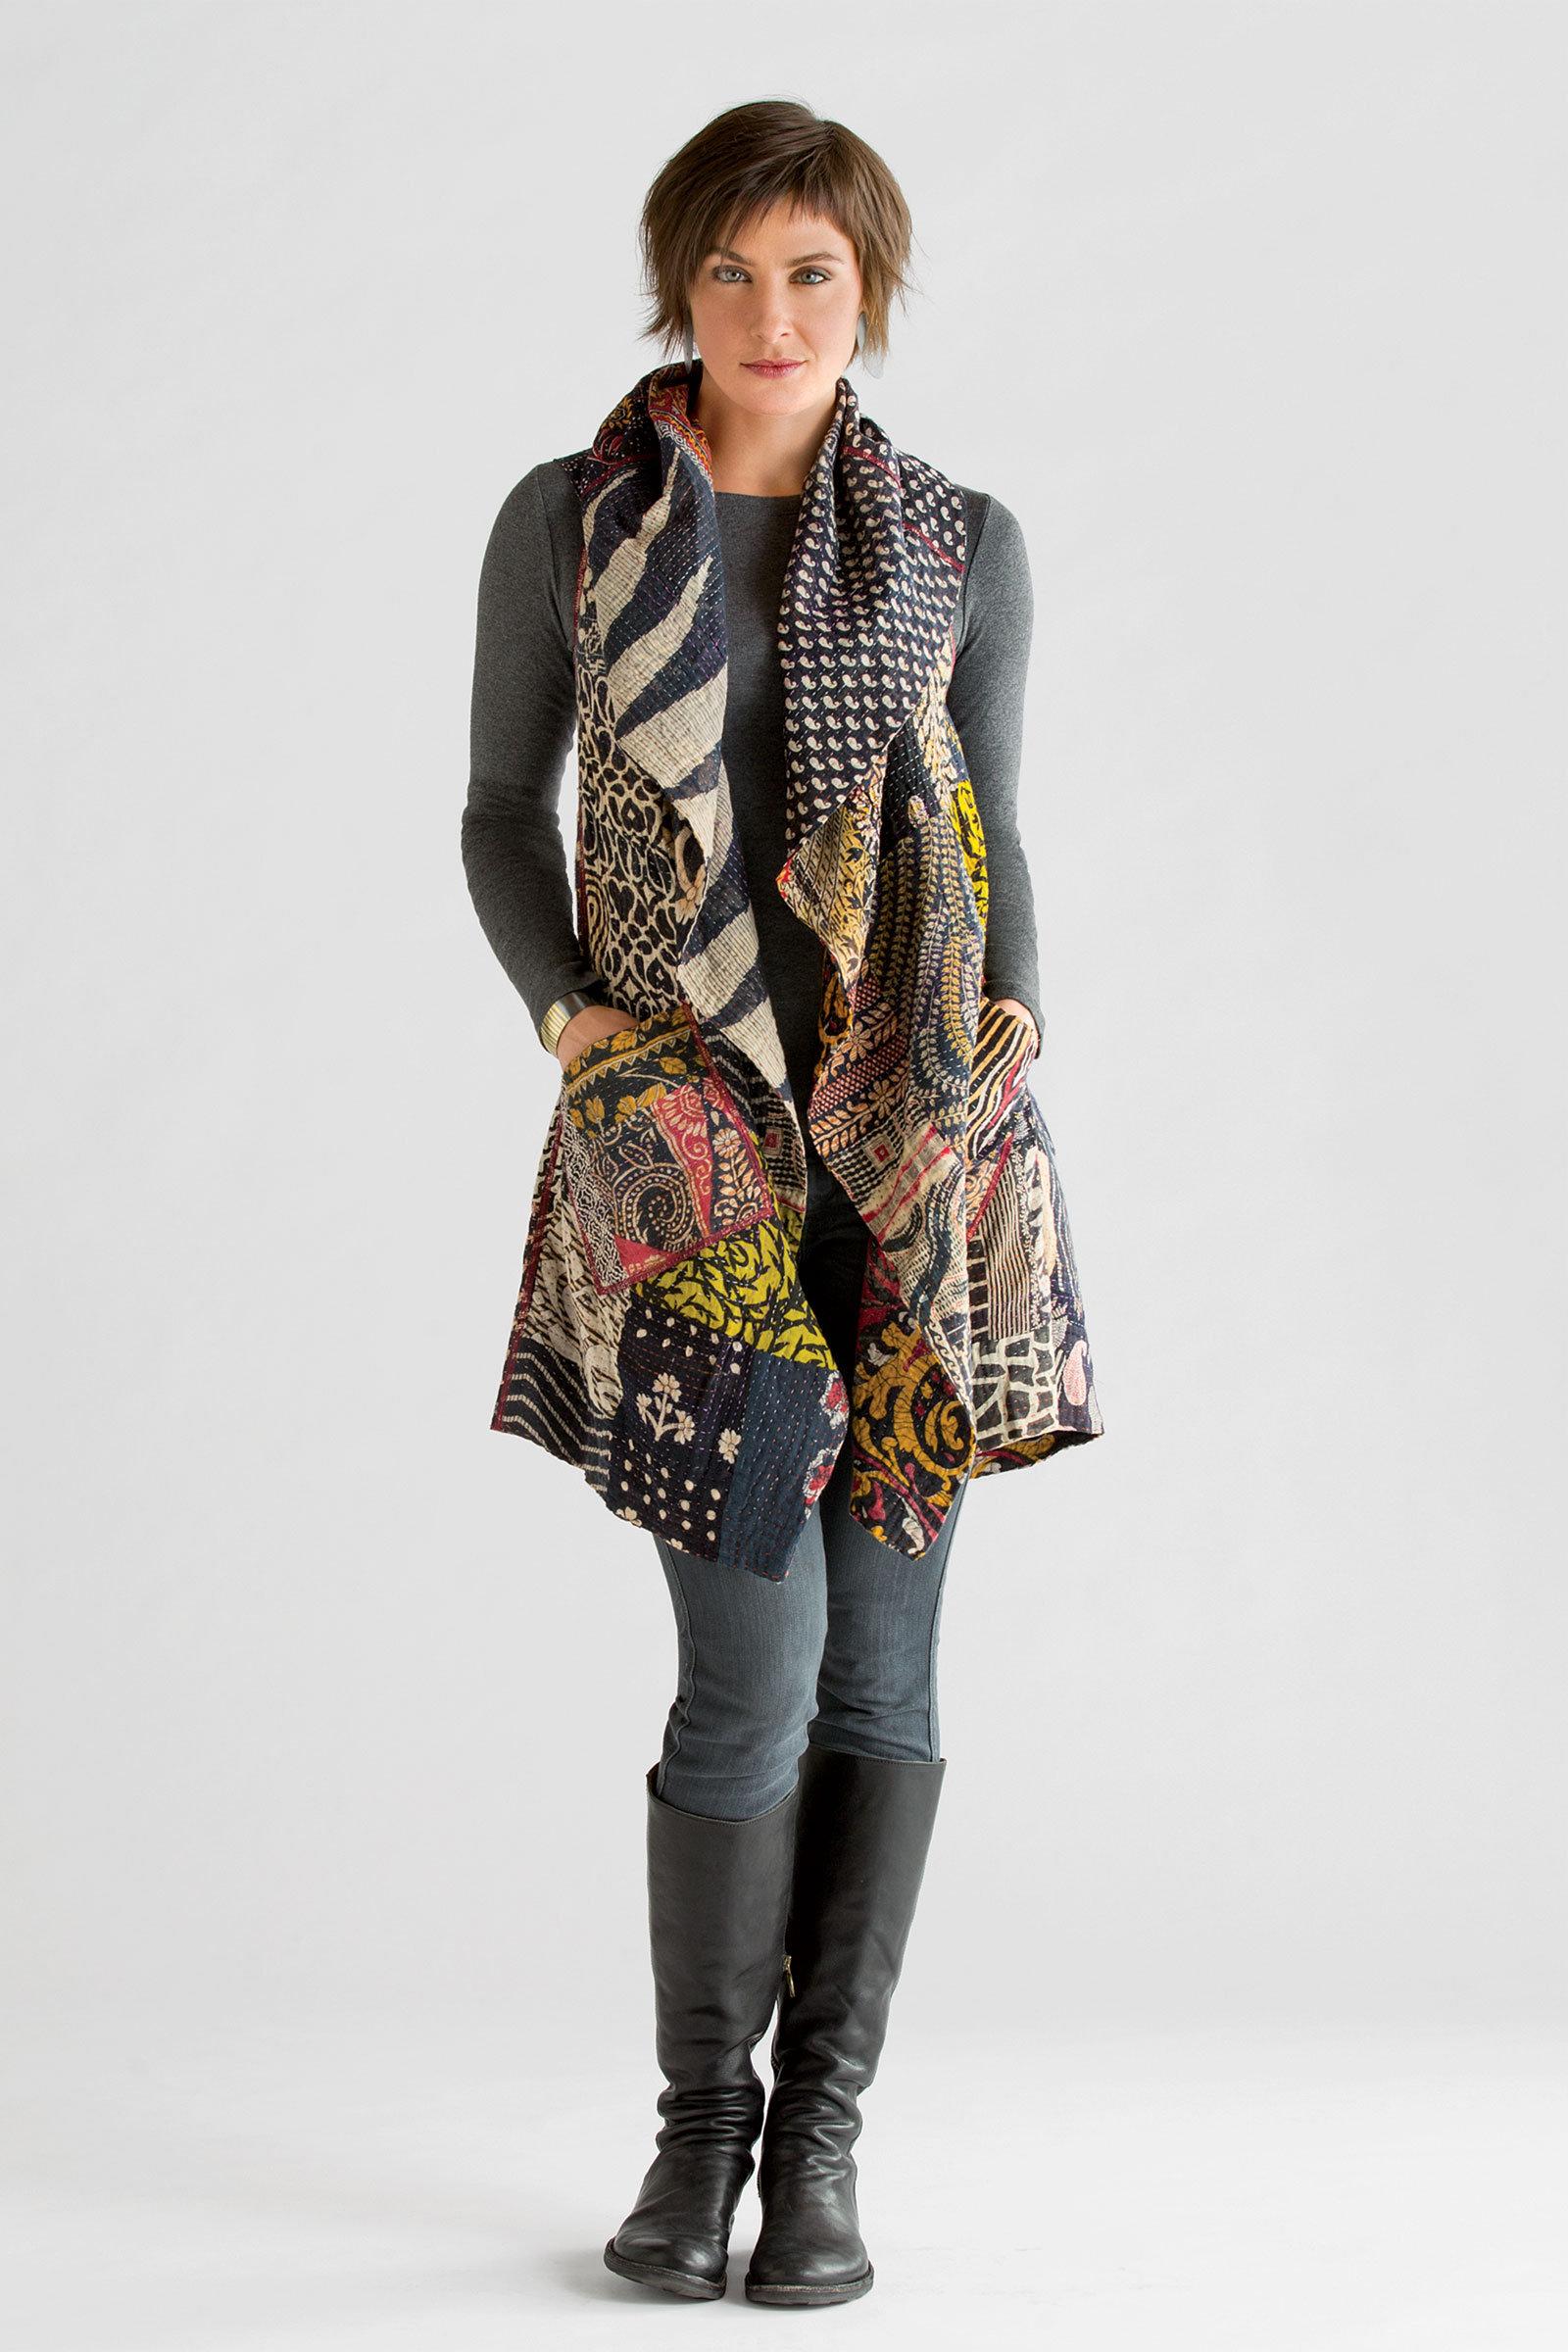 Kantha Patchwork Vest By Mieko Mintz Cotton Vest